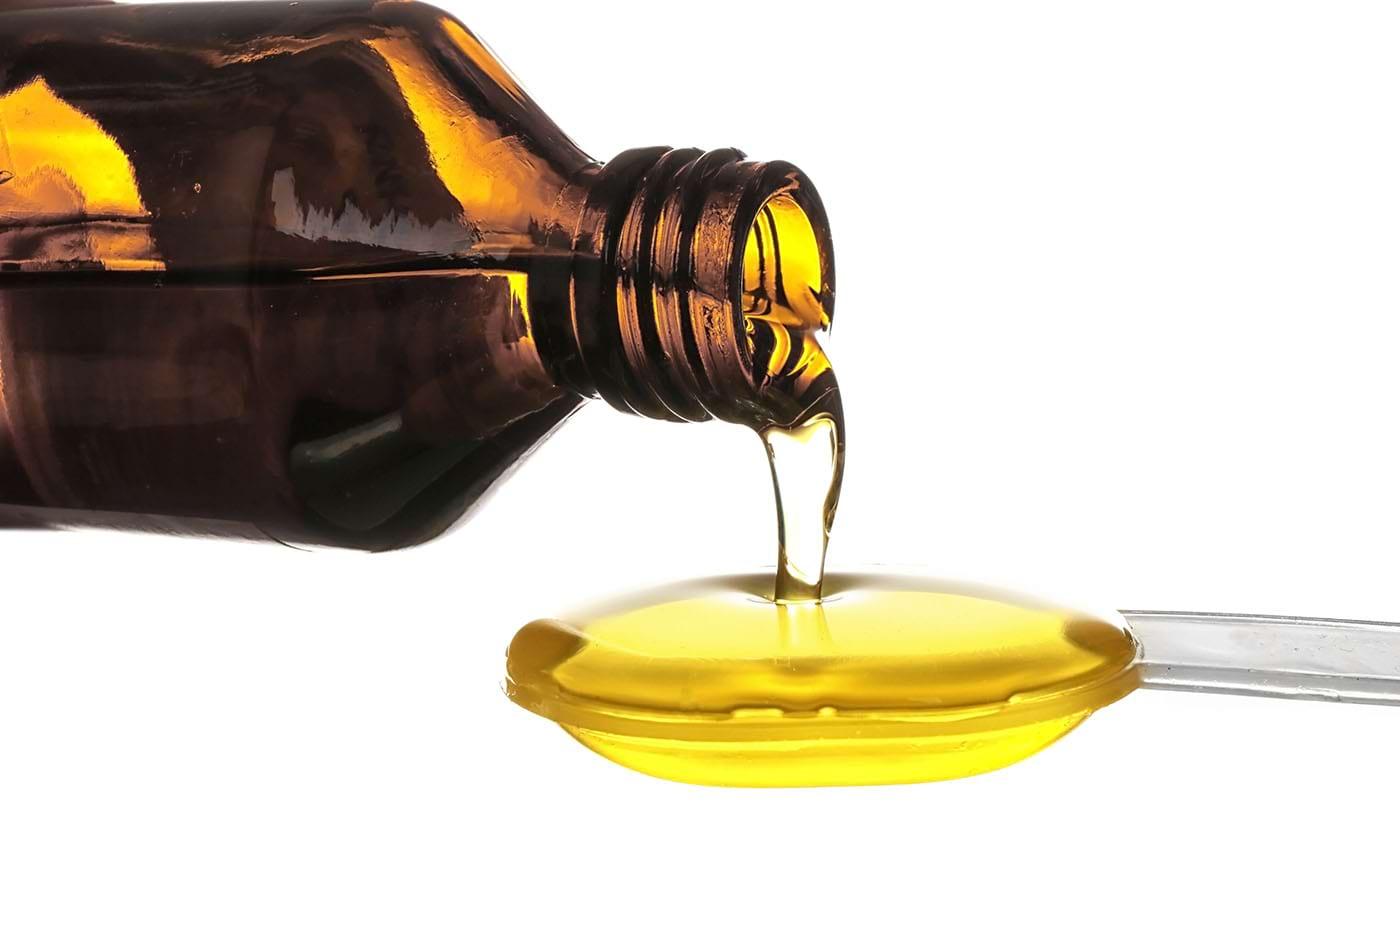 Când și cum ar trebui administrat uleiul de pește lichid?